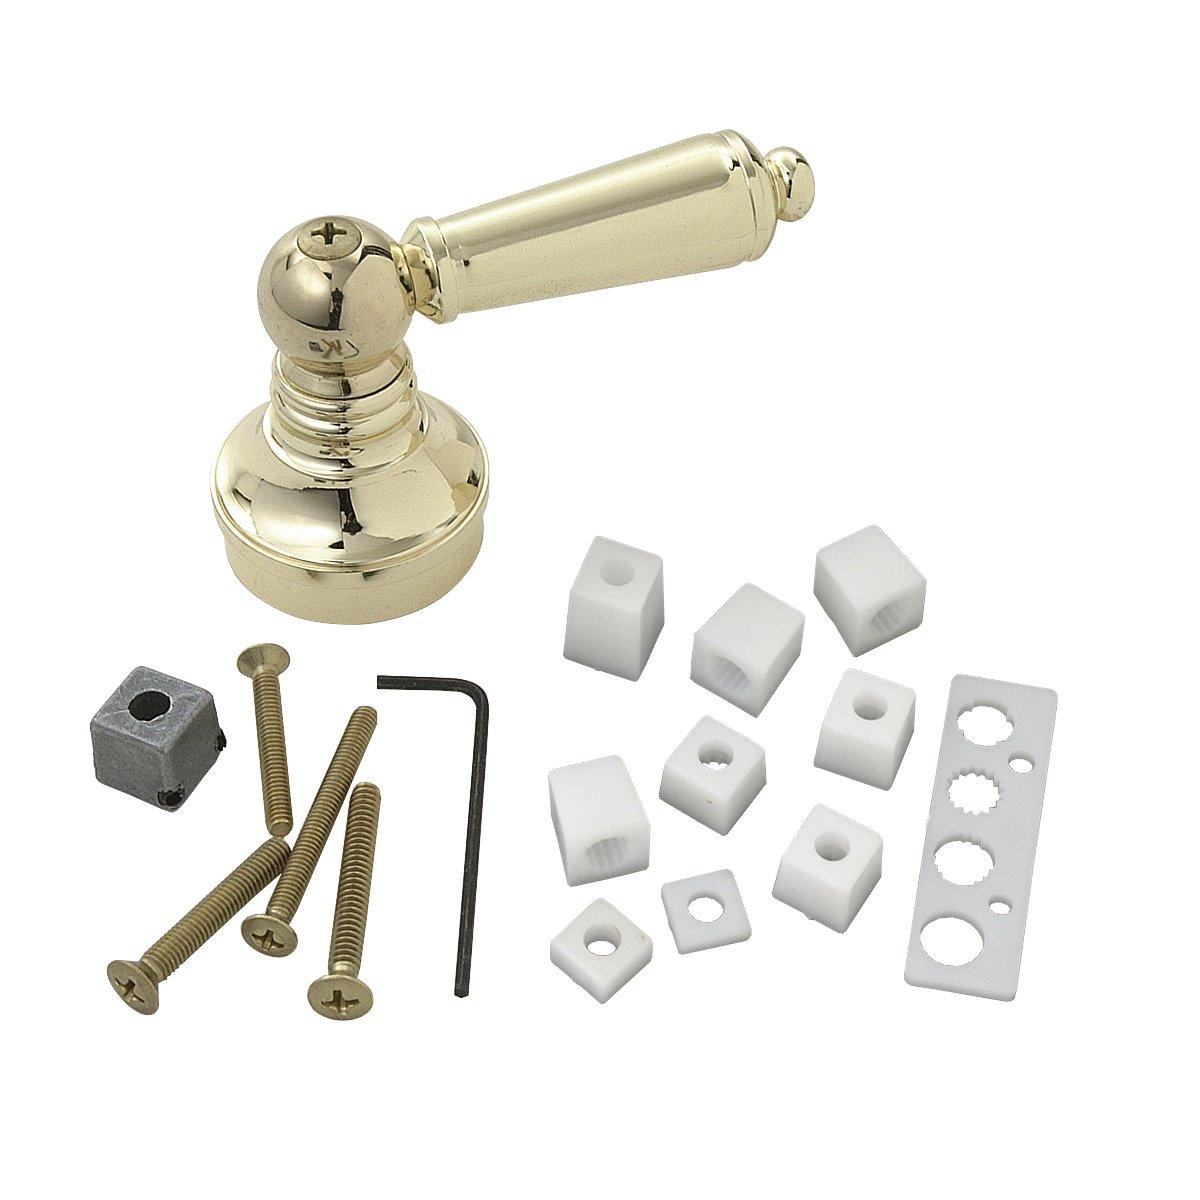 Brasscraft Sh5755 Universal Bathroom/Kitchen/Tub And Shower Faucet Lever Handle